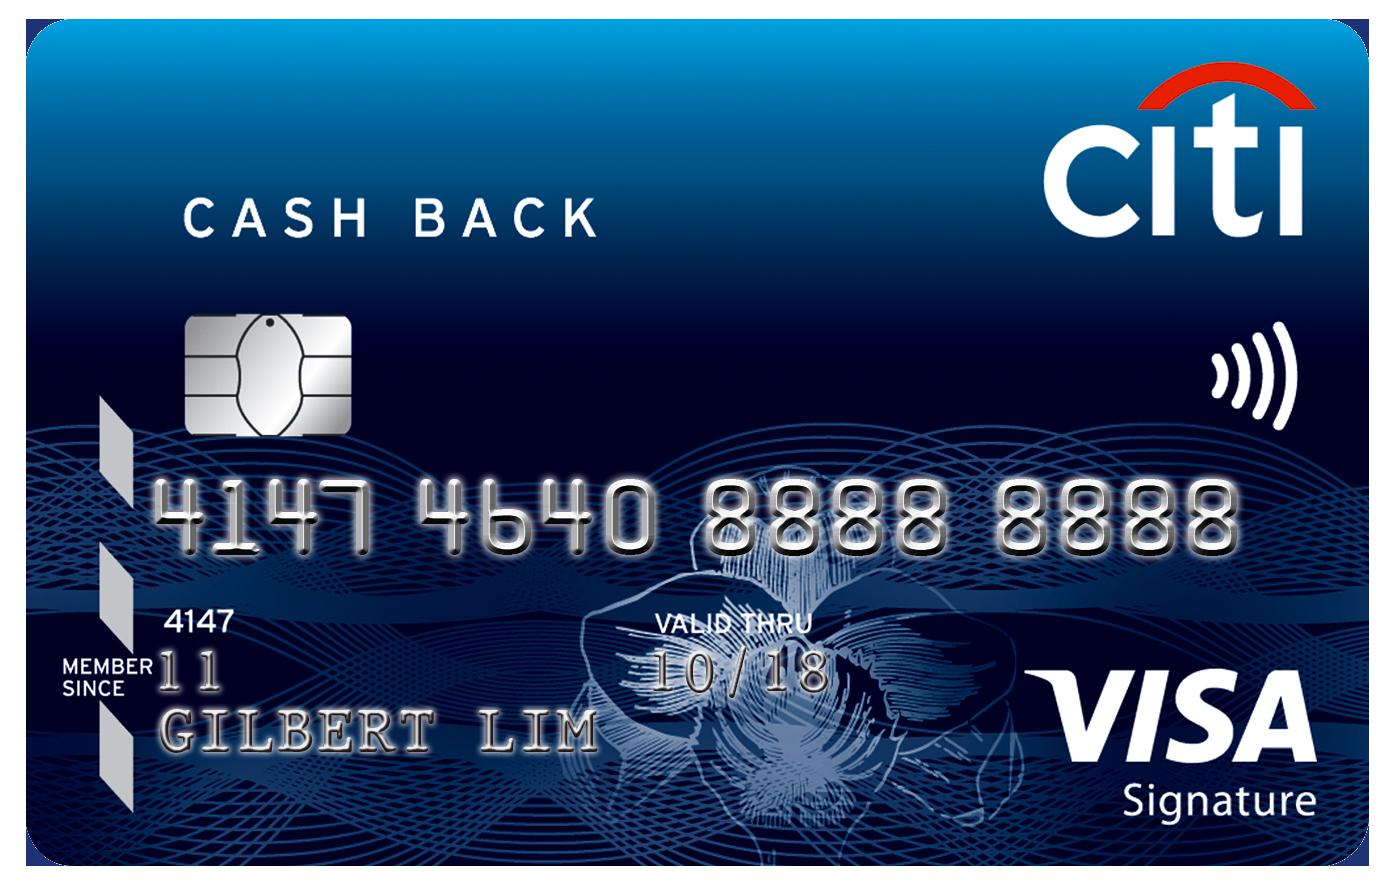 CITI-CashBack-Visa-Contactless